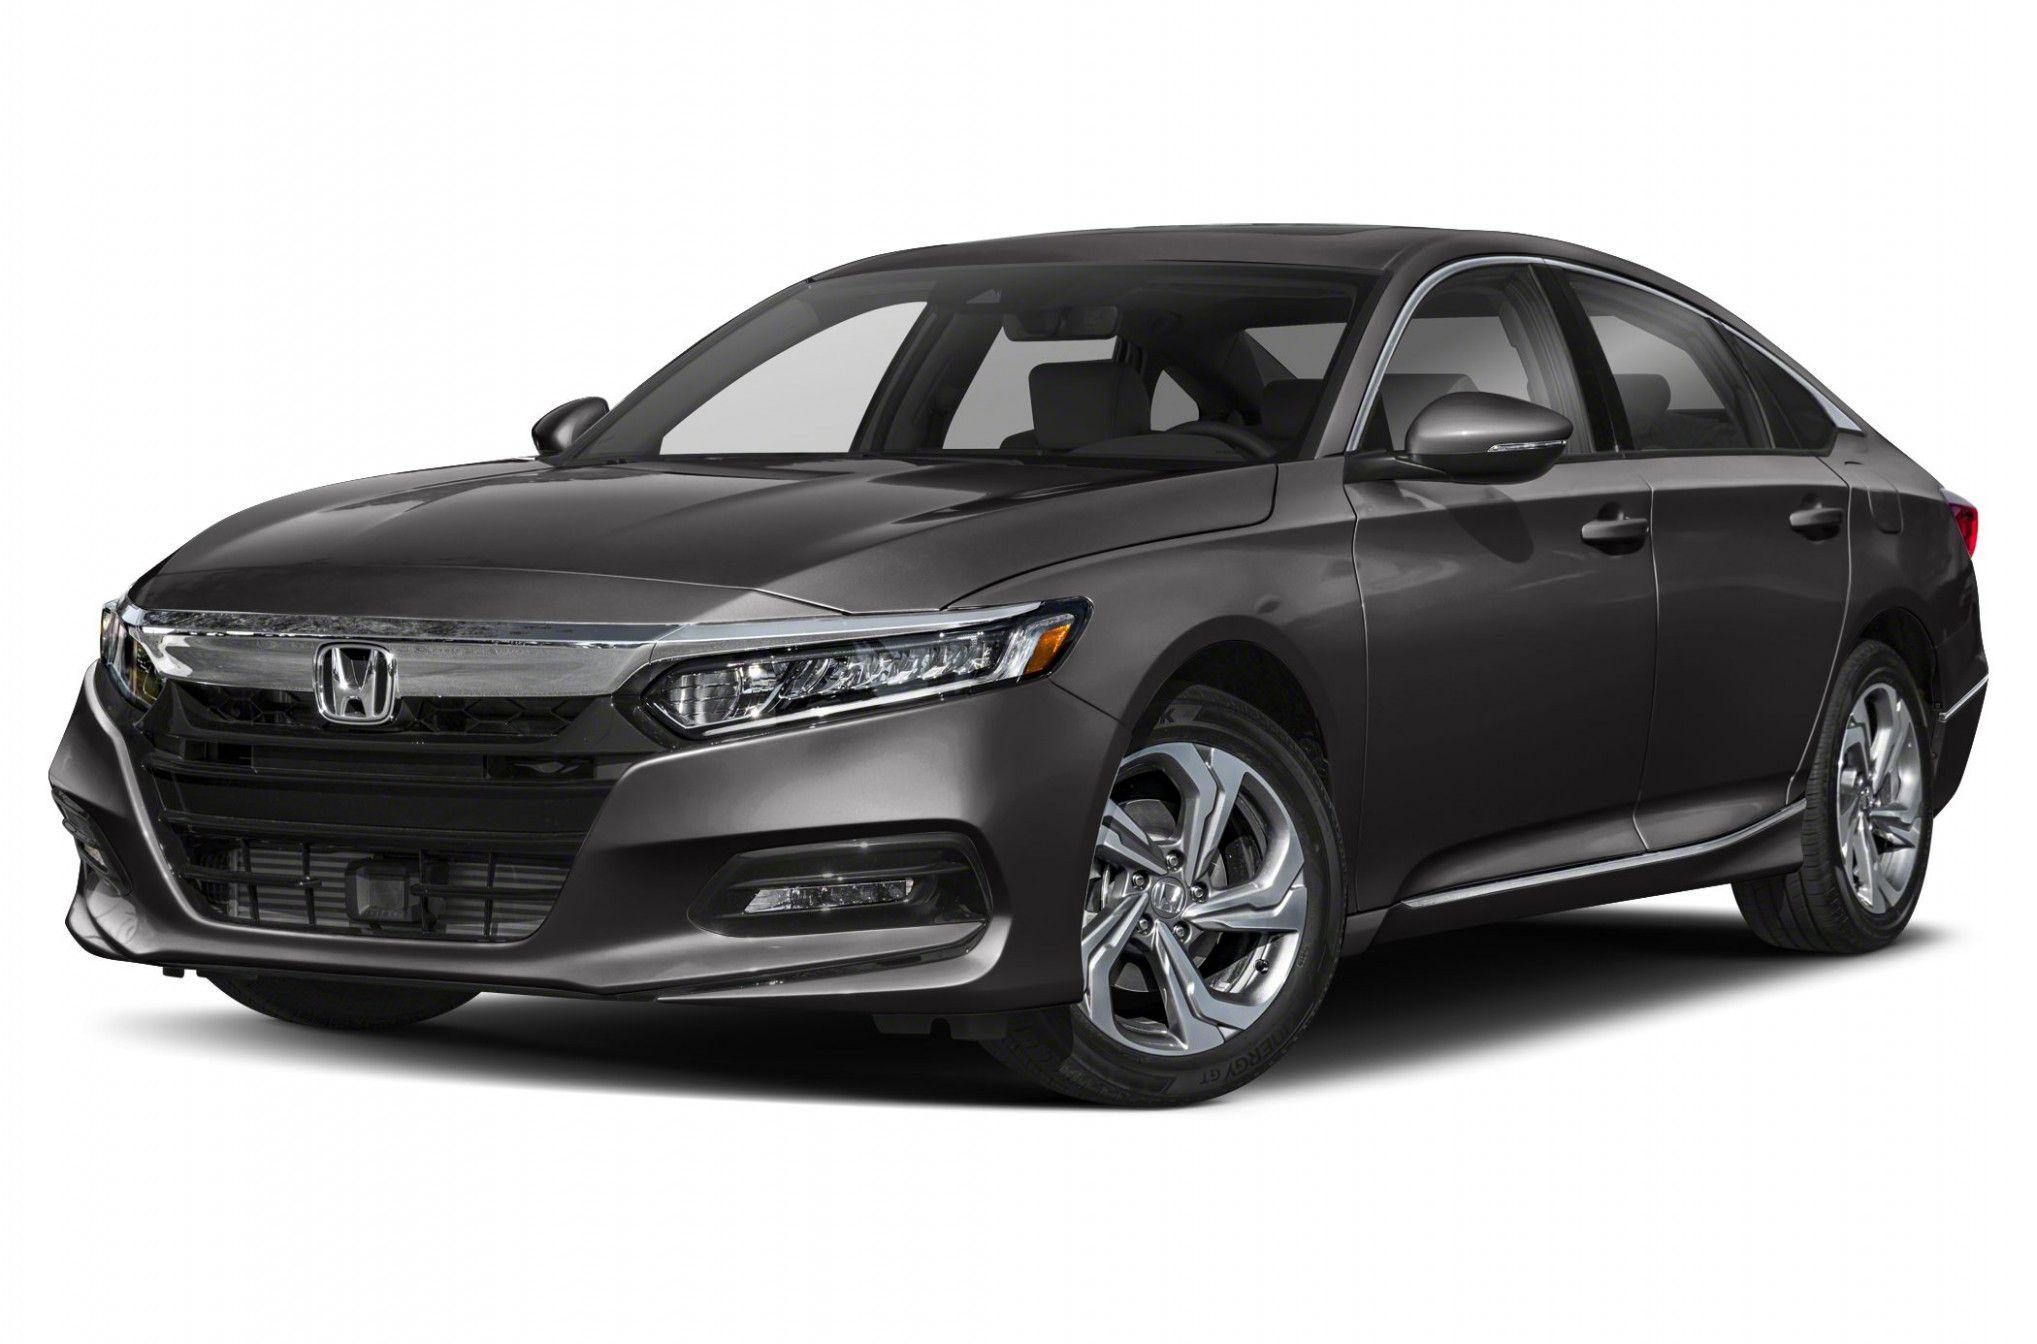 2020 Honda Accord Colors in 2020 Honda accord, Honda